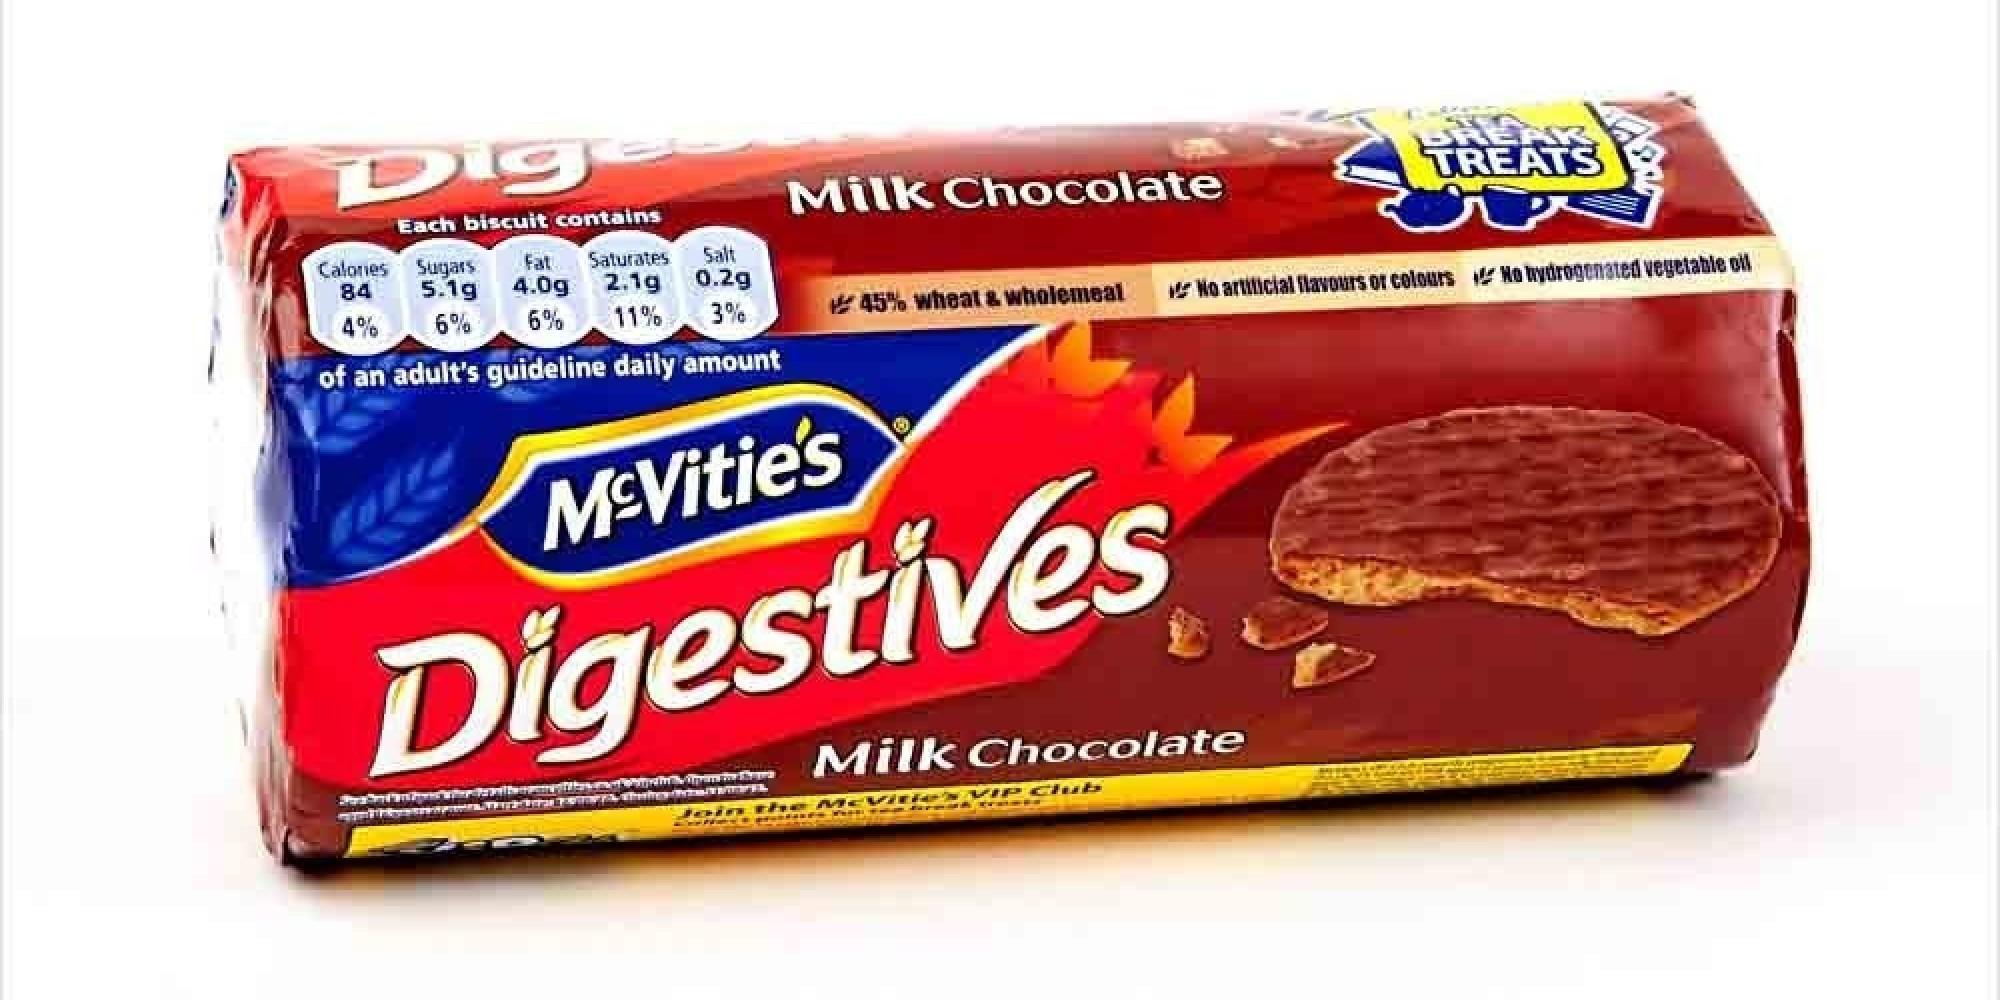 Chocolate Chip Cookies Brands Uk